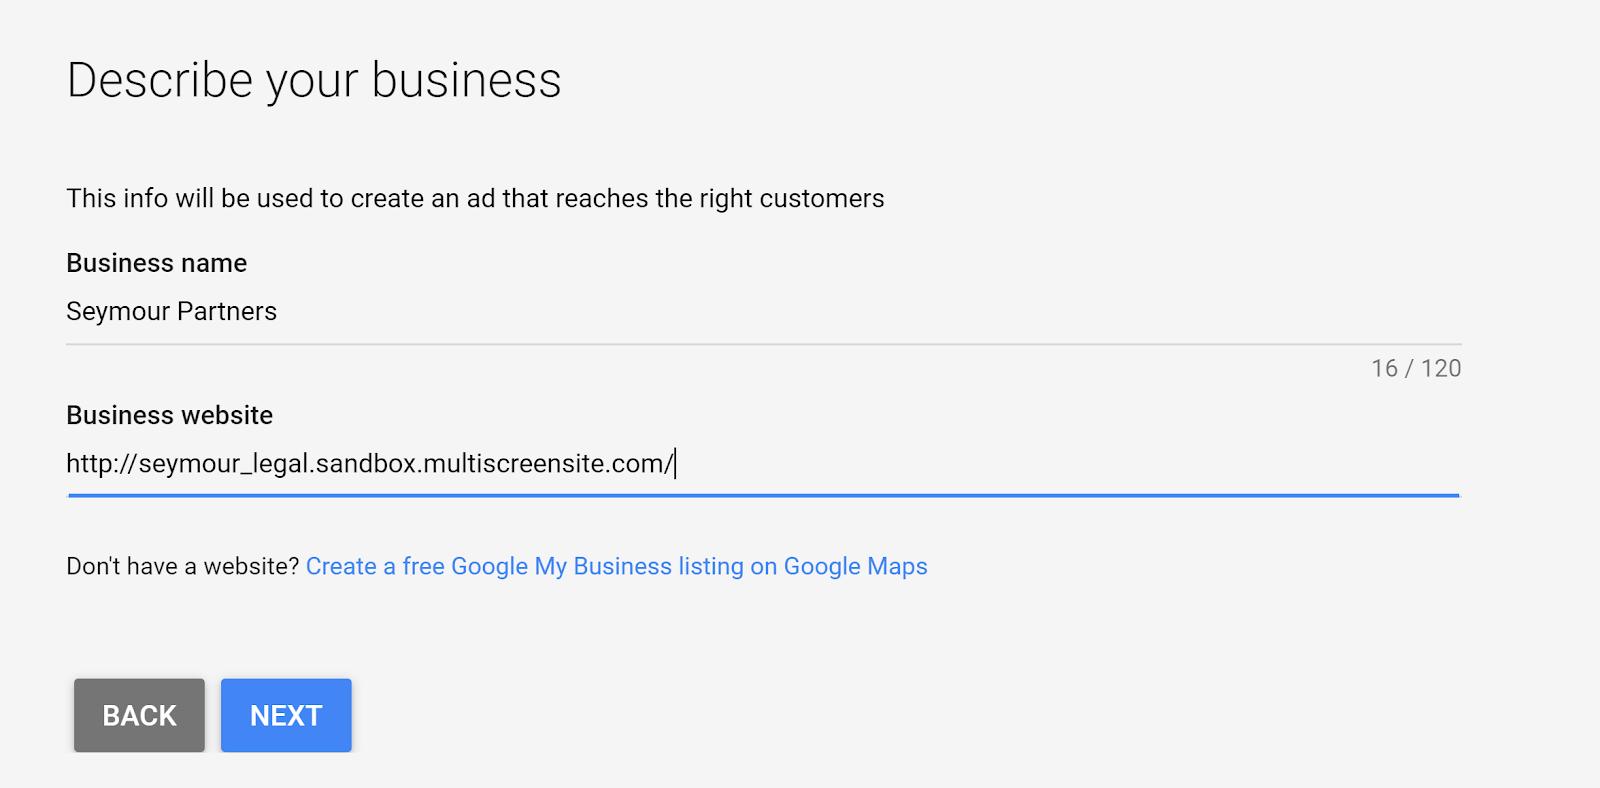 Google Ads Smart Campaign - Step 8